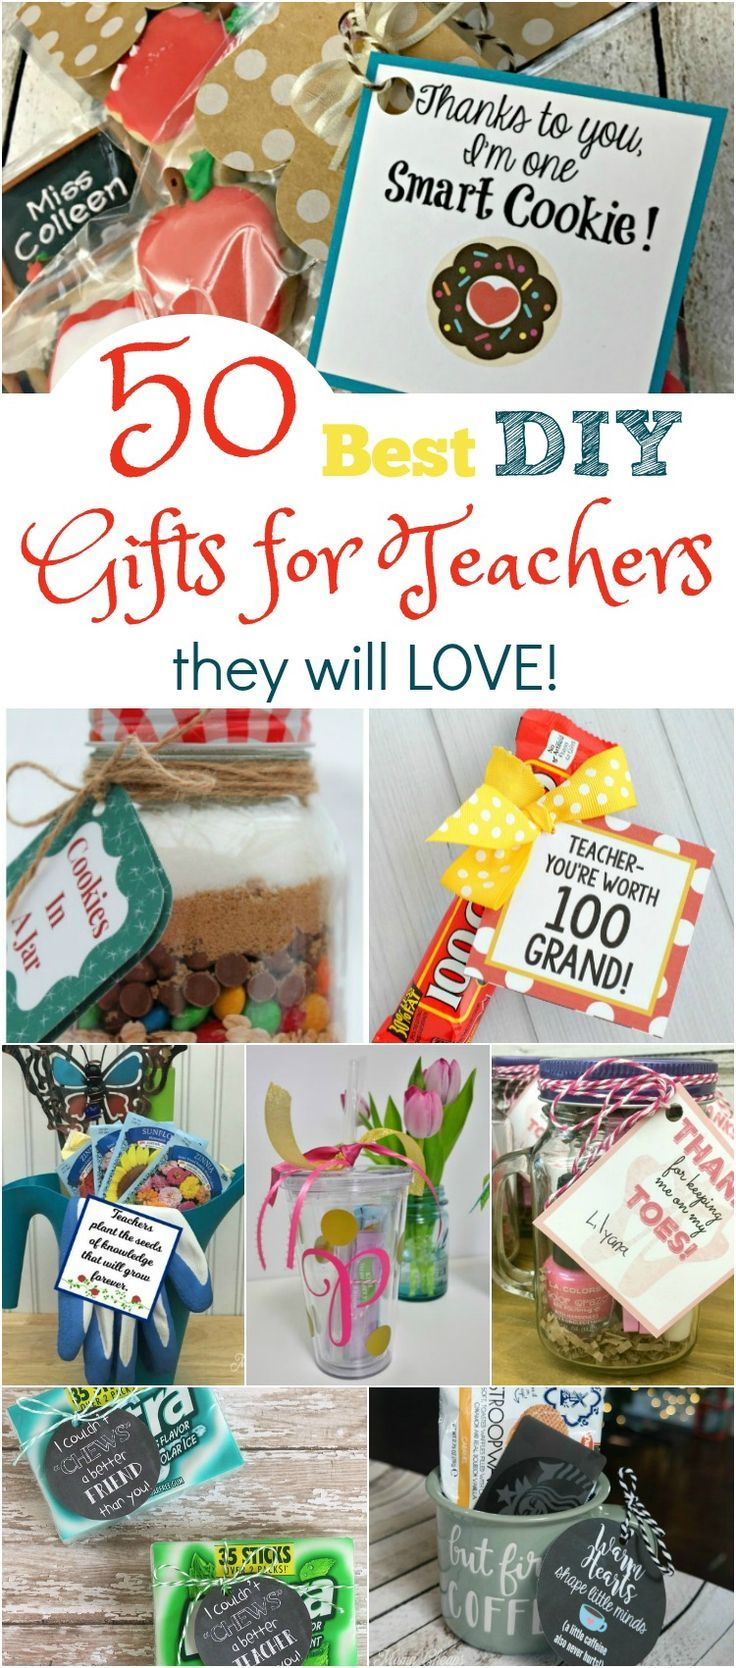 50 Best DIY Teachers Gifts They Will Love | Creative | Pinterest ...